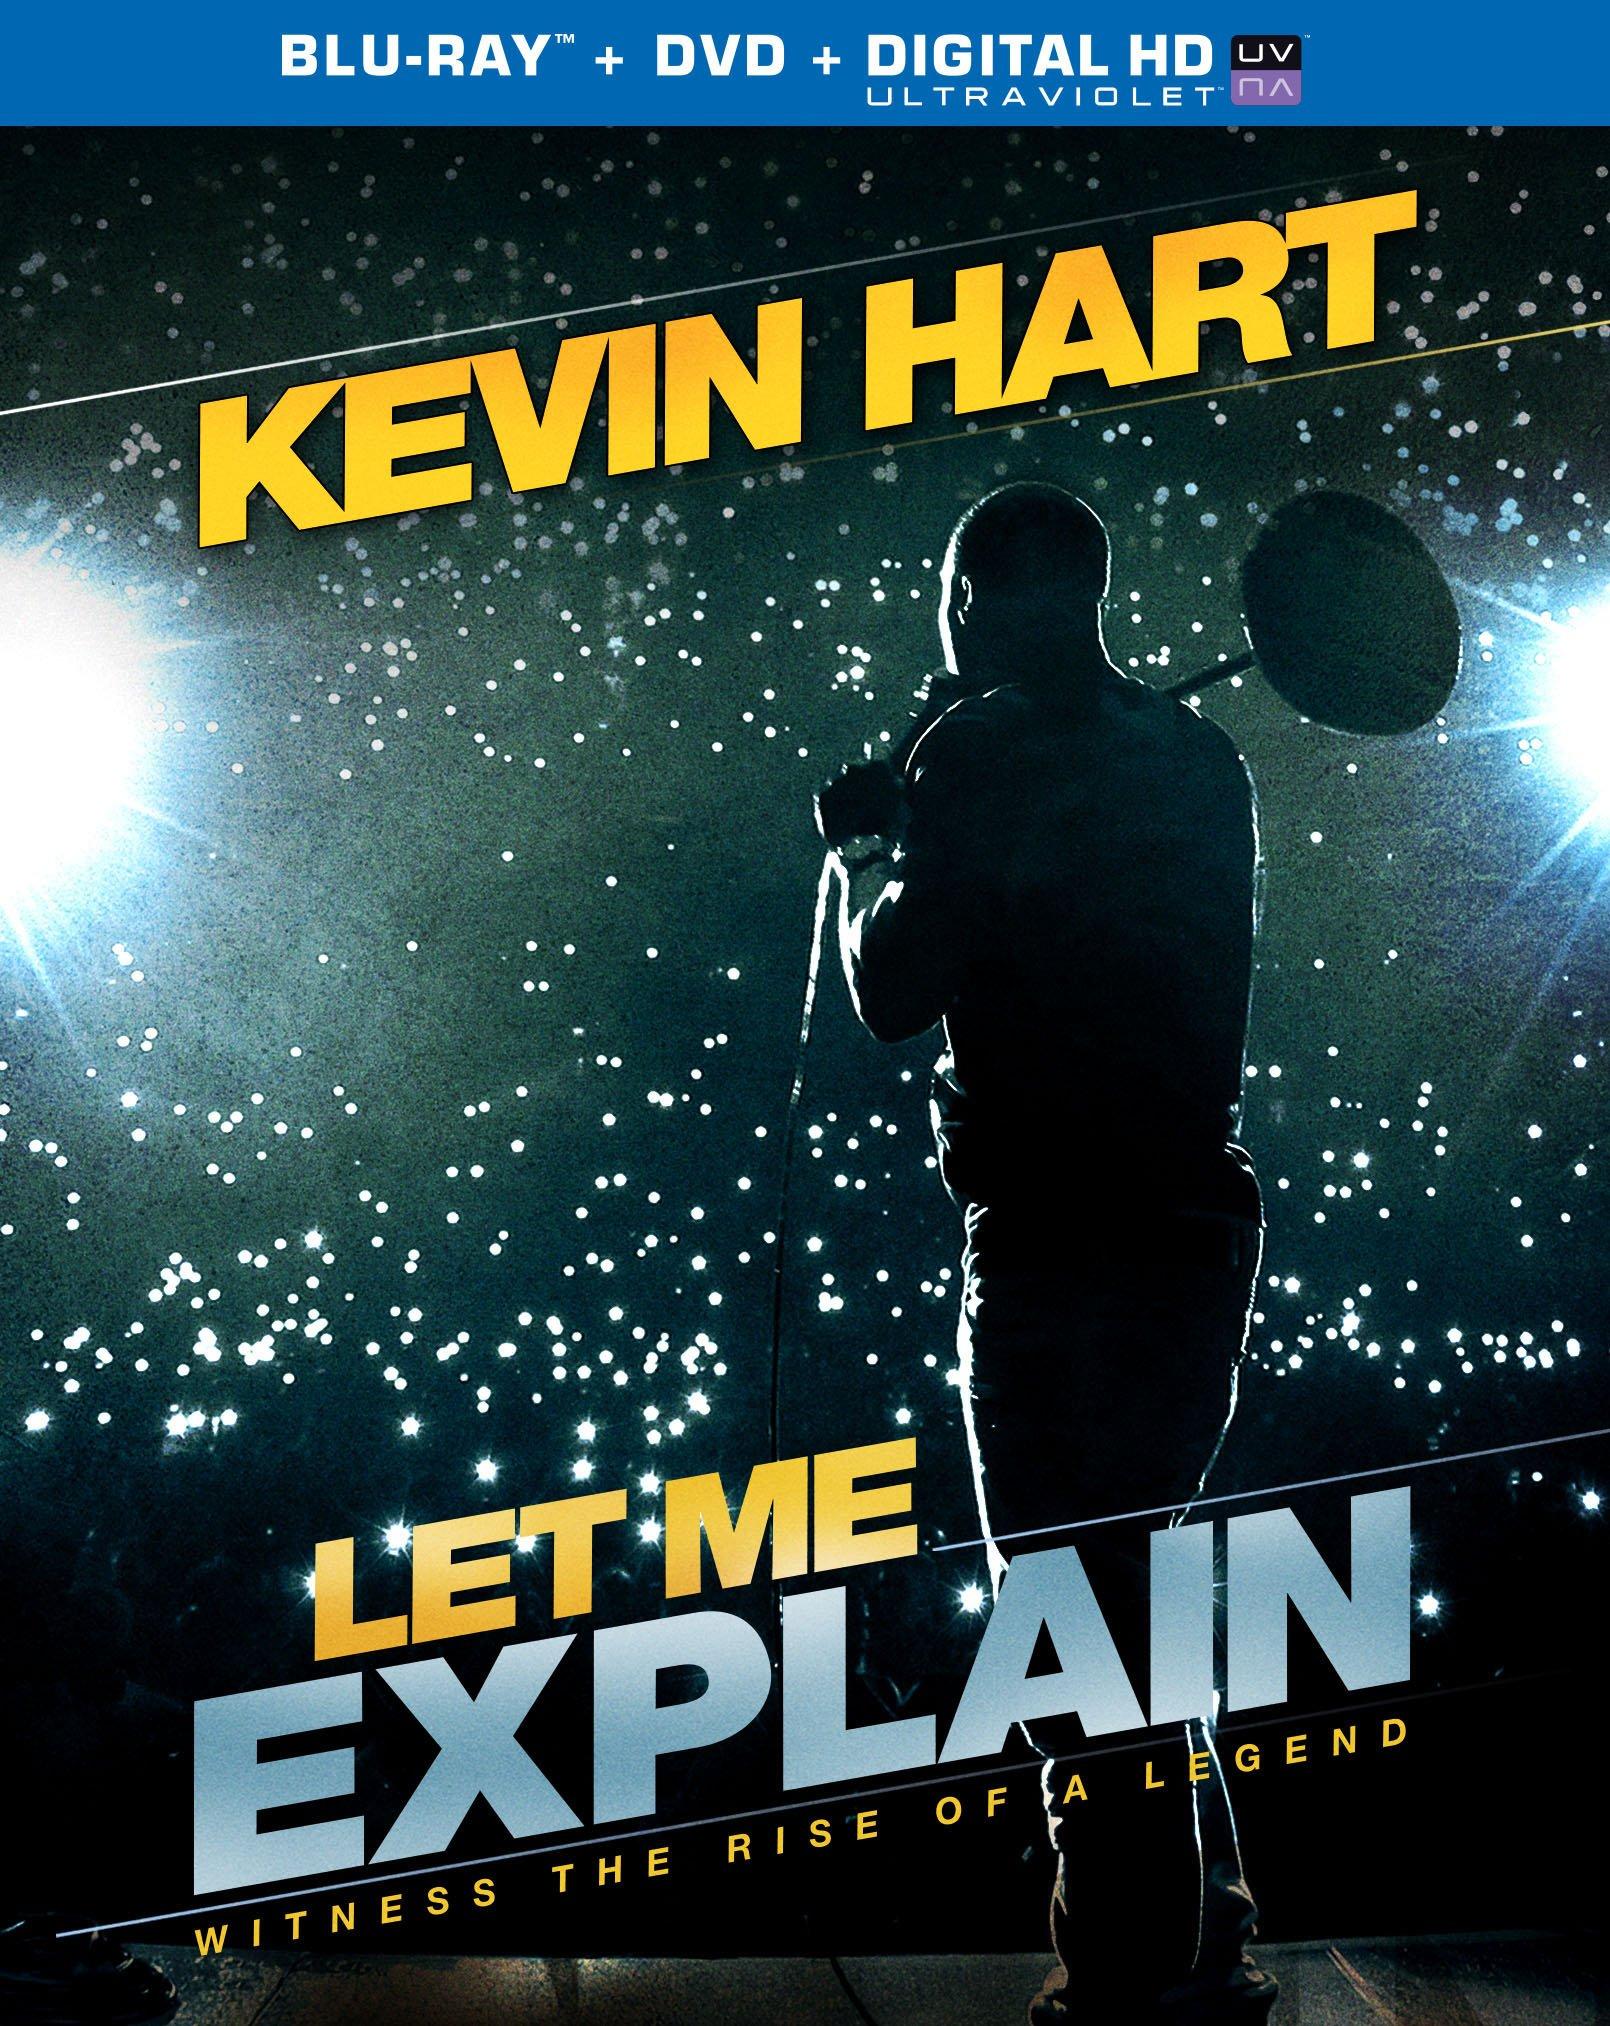 Kevin Hart Let Me Explain [Blu-ray + DVD + Digital]